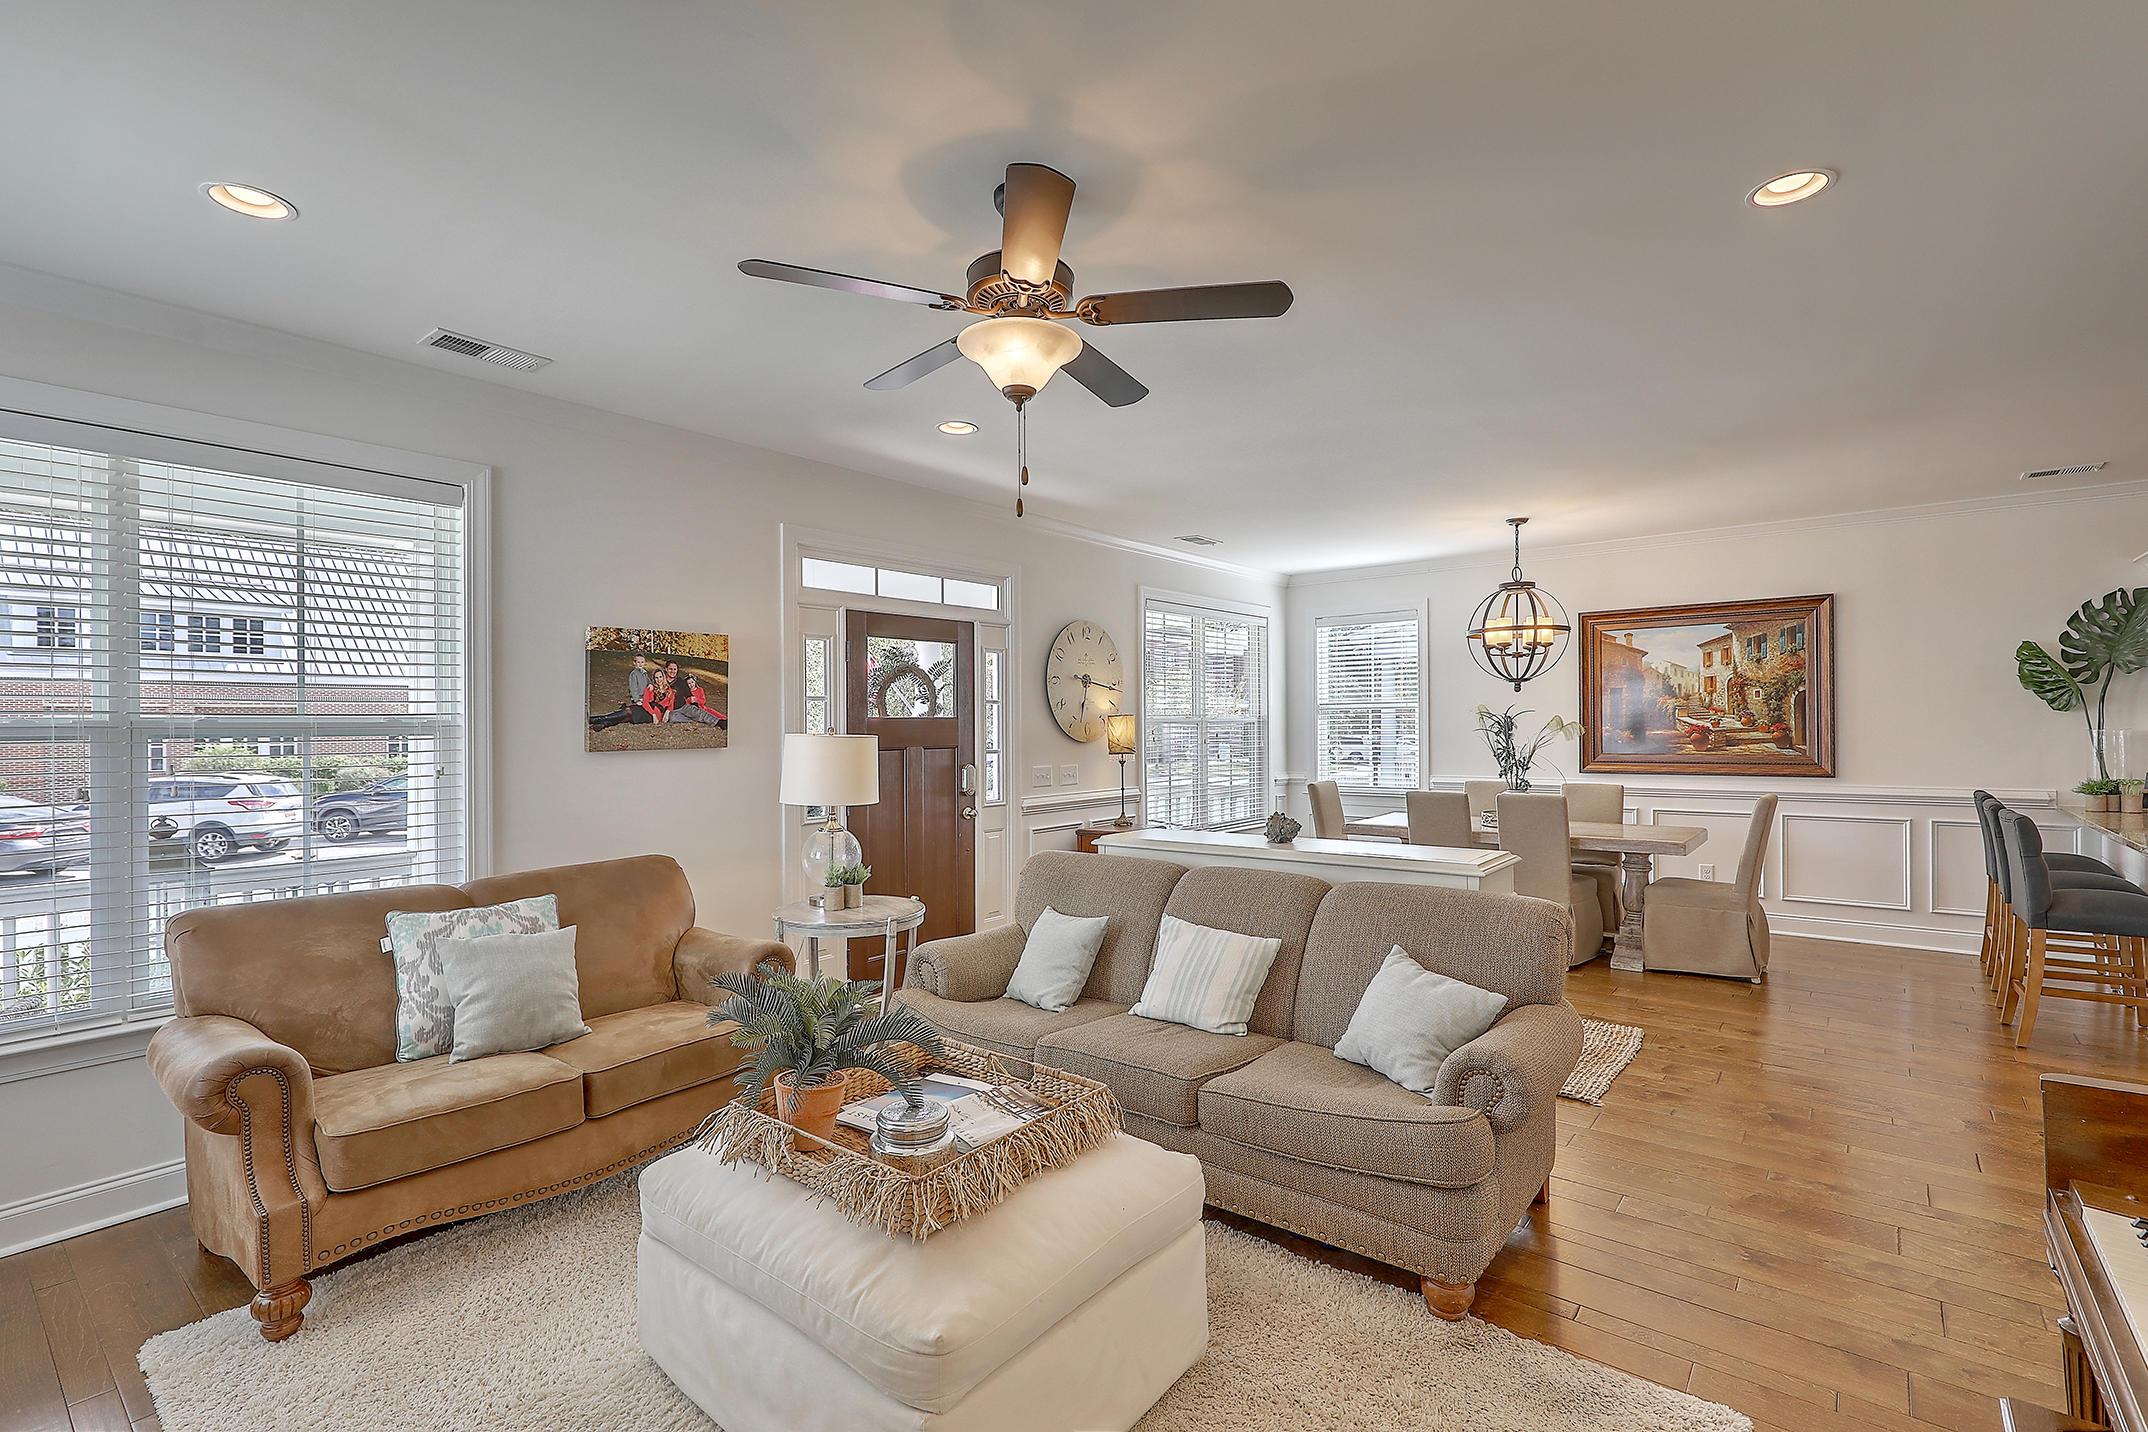 Park West Homes For Sale - 3412 Salterbeck, Mount Pleasant, SC - 5